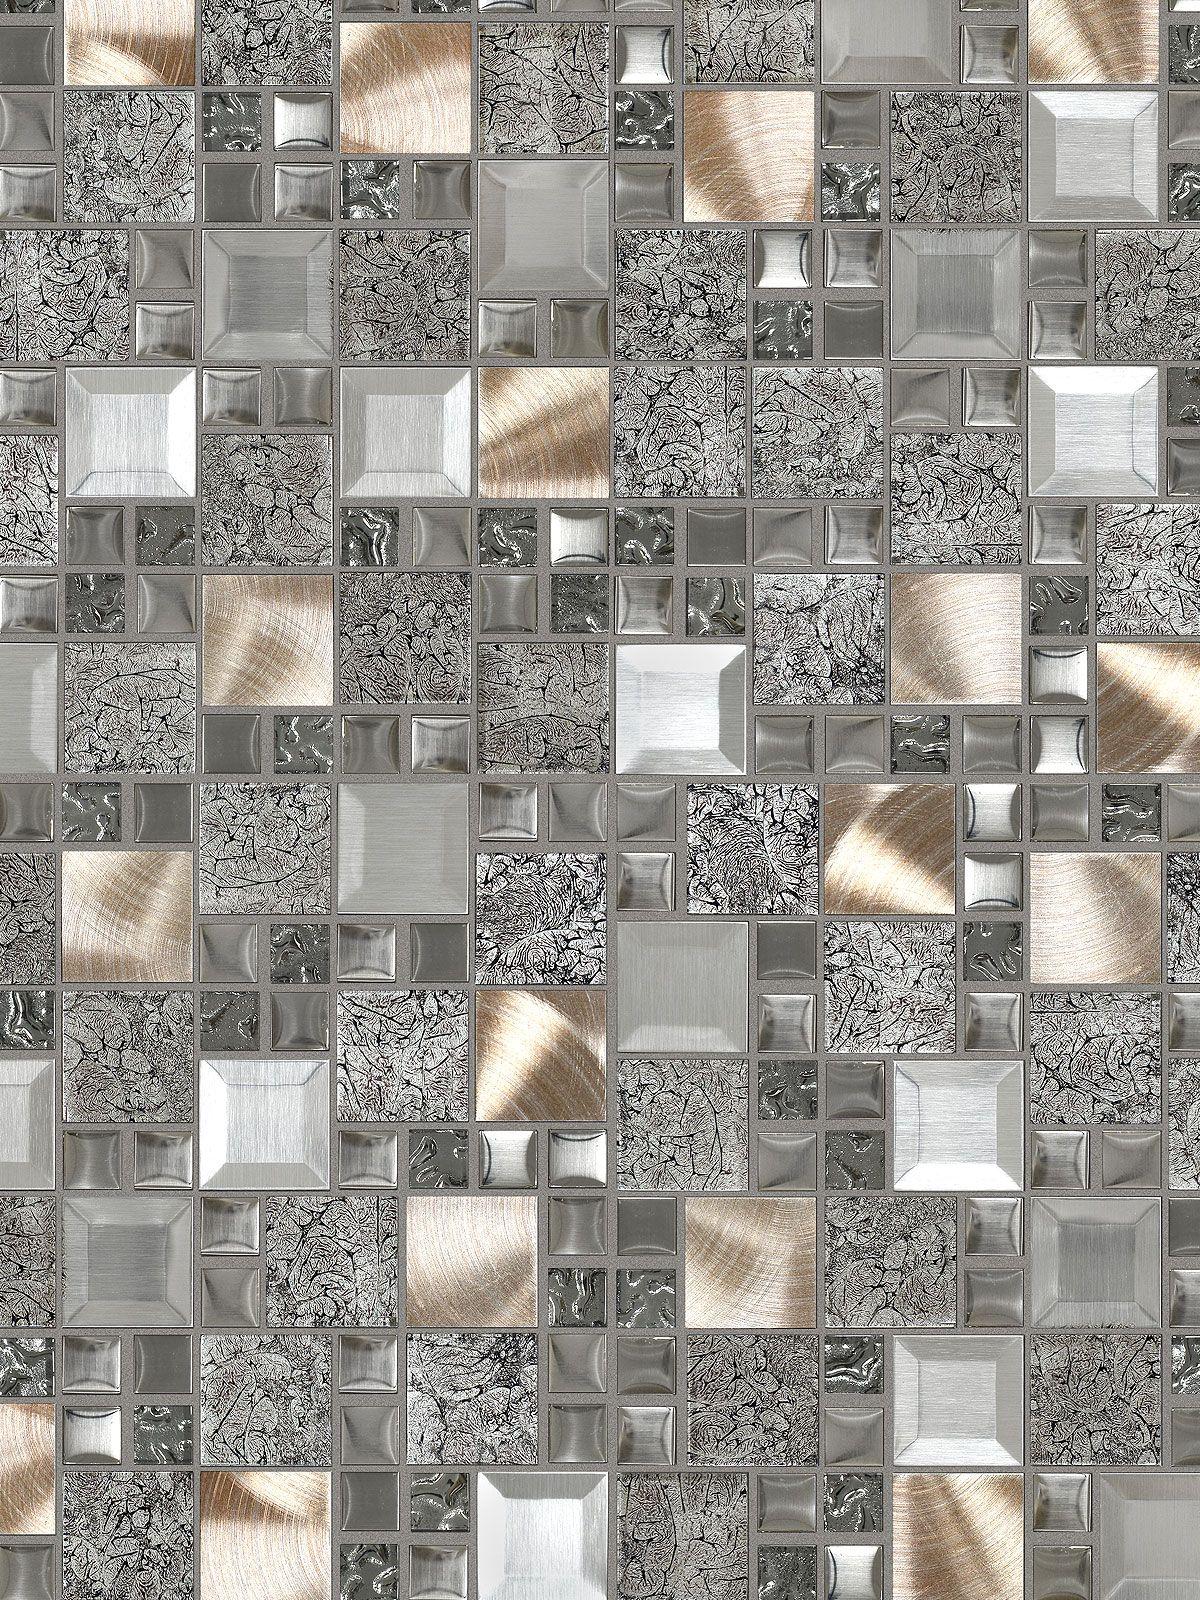 Modern Random Mix Steel Kitchen Backsplash//Bathroom Wall//Home Decor//Fireplace Surround Glass II//Stainless Steel and Glass Mixed Metal Tile